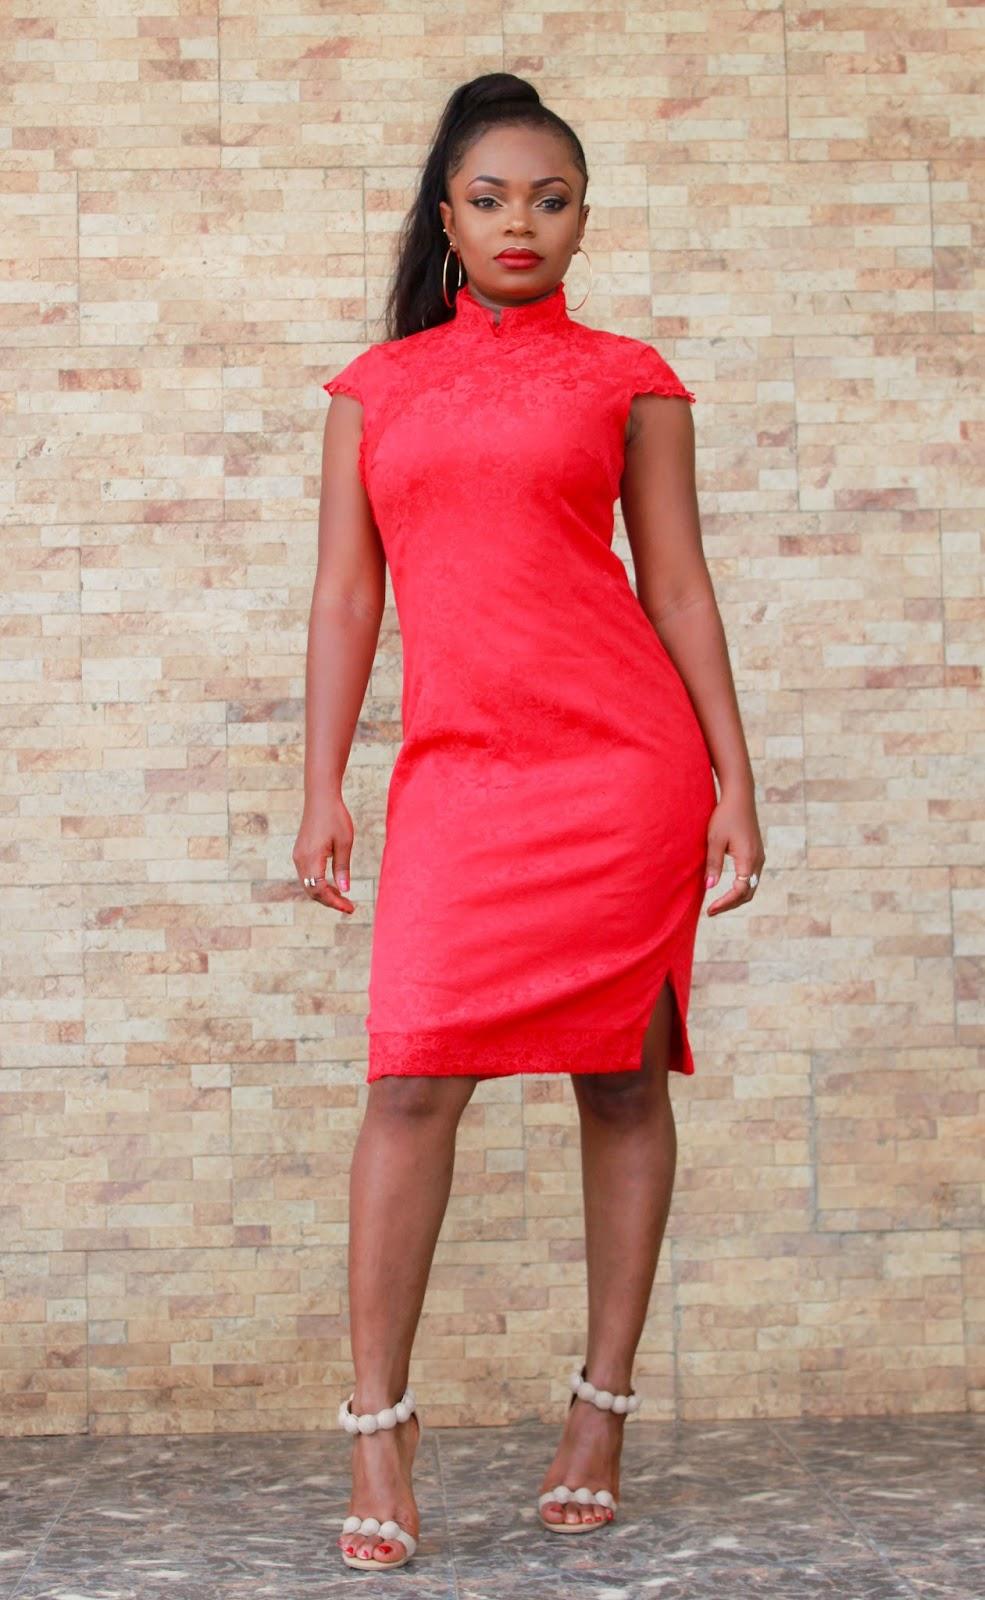 GEISHA STYLE DRESS